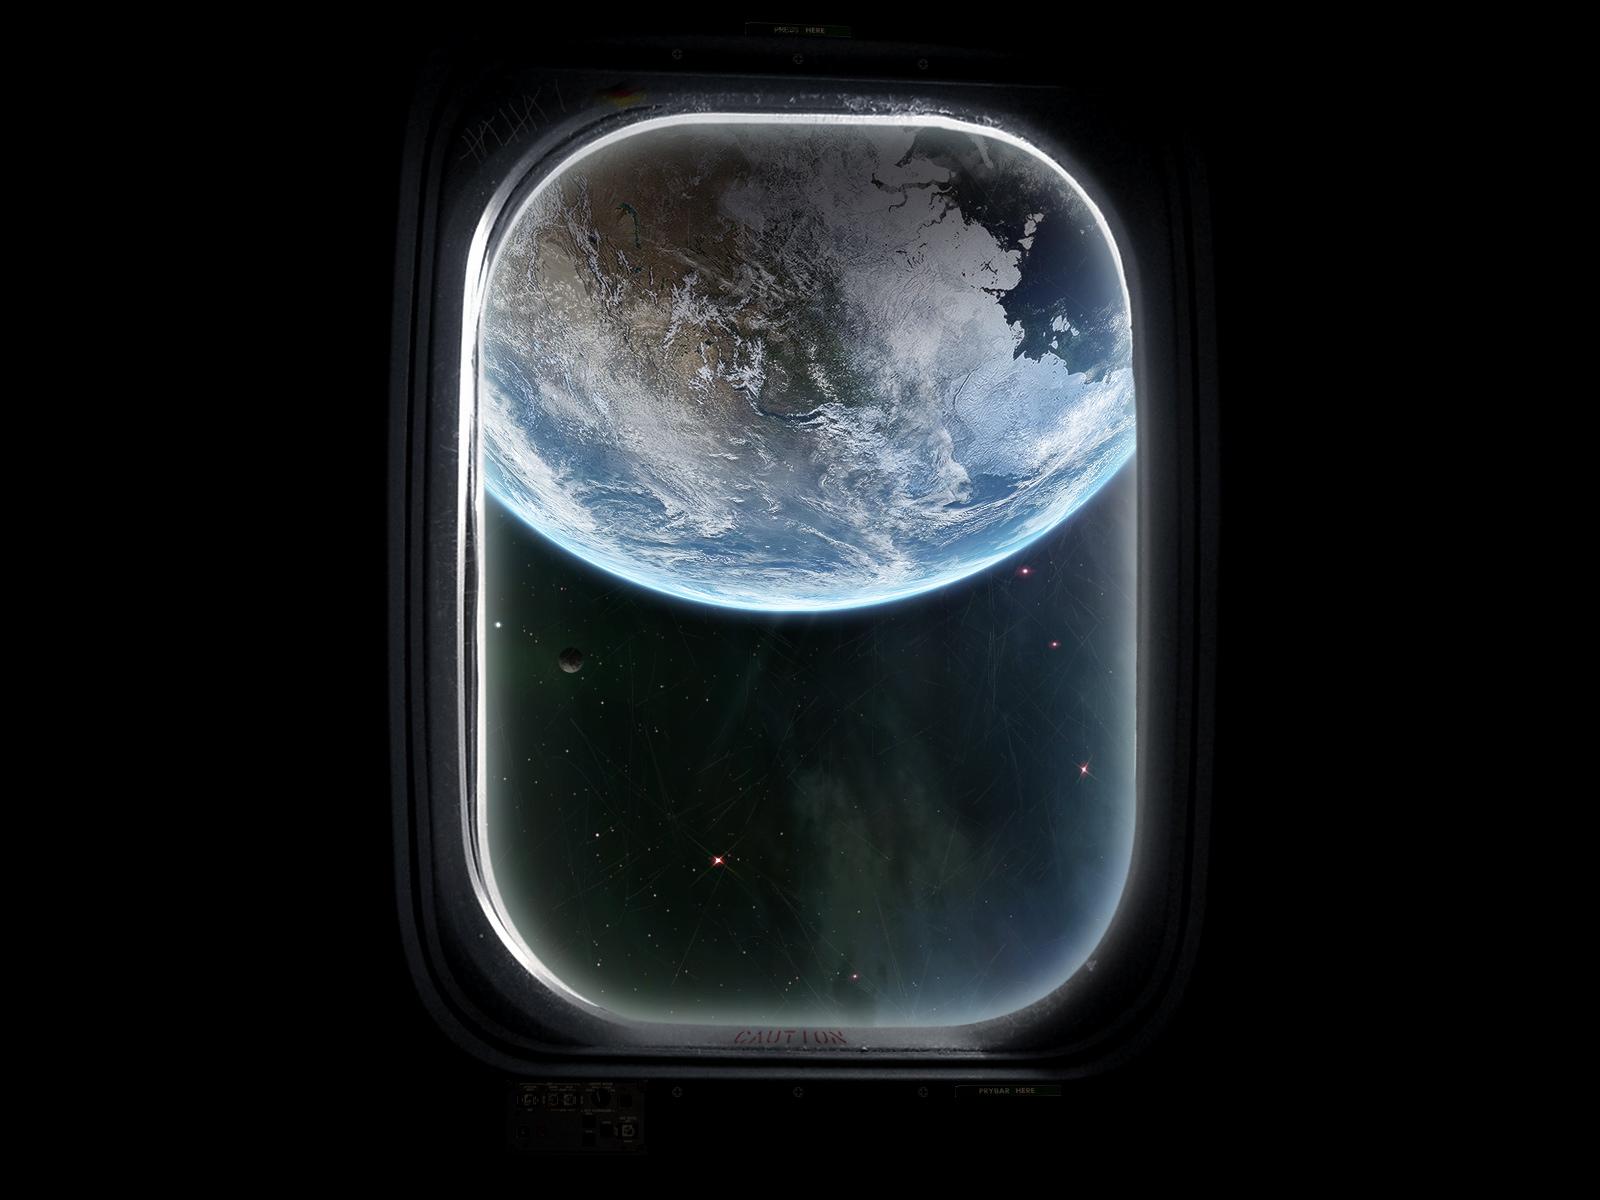 Земляне. Земля в иллюминаторе (Трава у дома) - YouTube